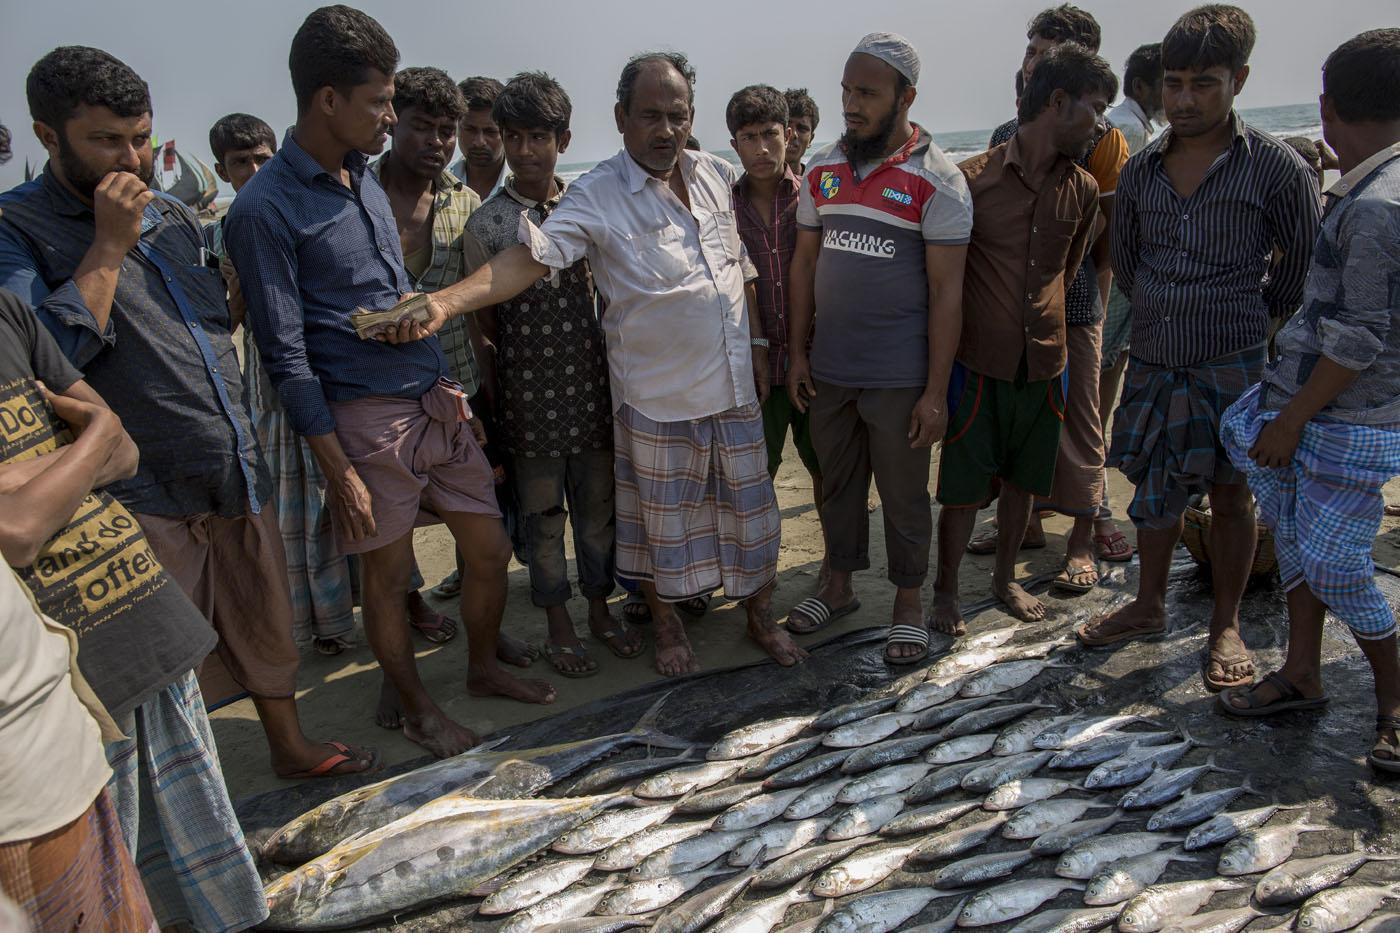 Probal Rashid_Bangladesh_The Rohingyas-A People Without A Home_18.jpg